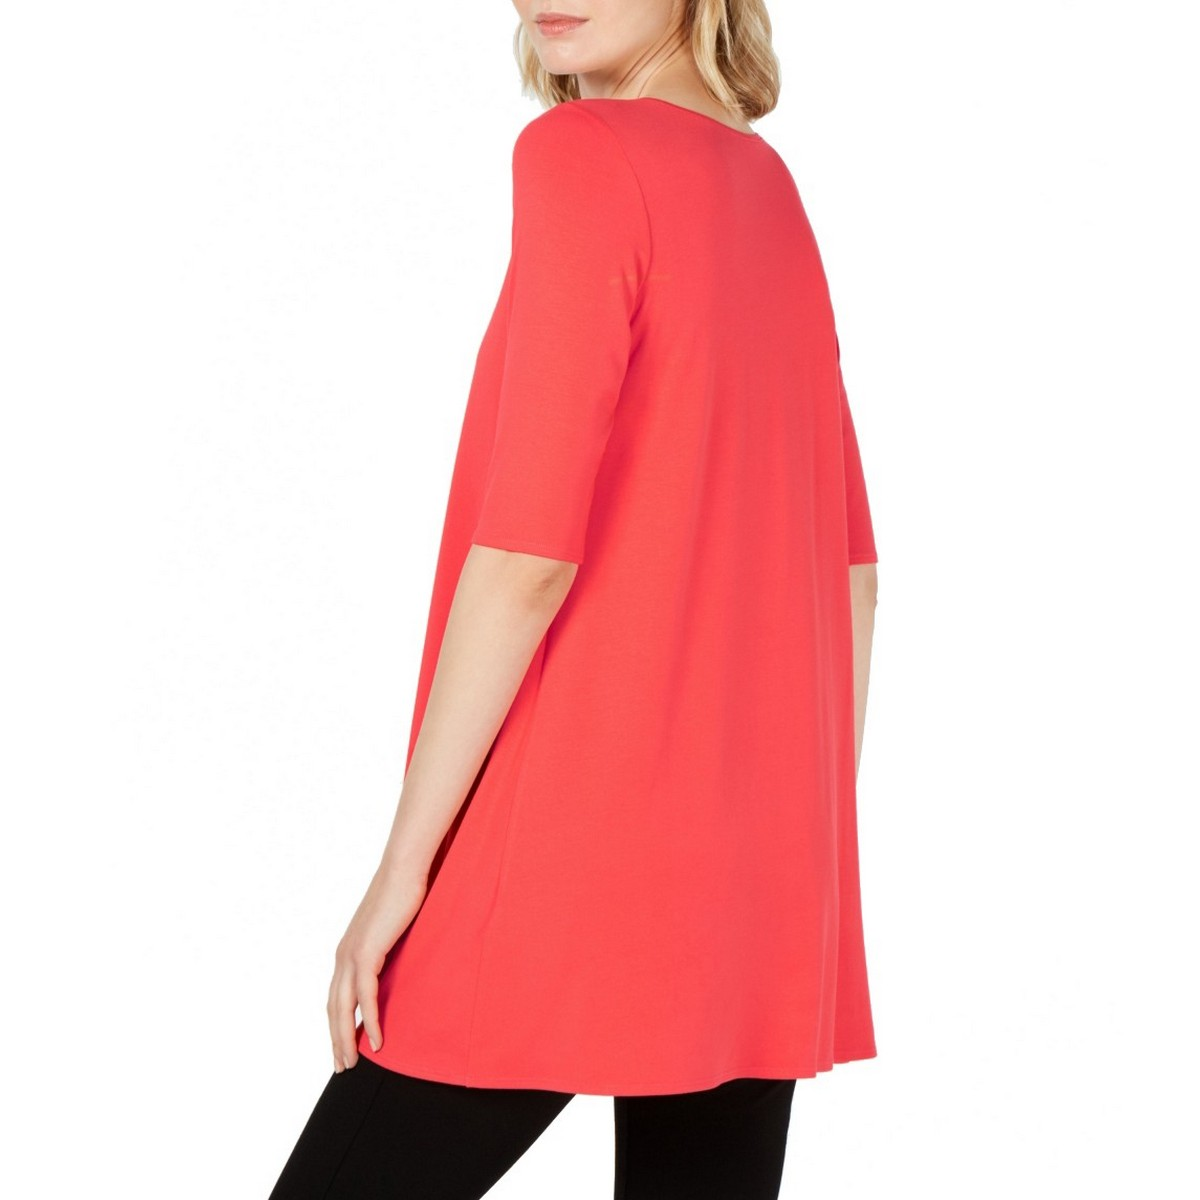 EILEEN-FISHER-NEW-Women-039-s-Jersey-Scoop-Neck-Elbow-Sleeve-Tunic-Shirt-Top-TEDO thumbnail 5